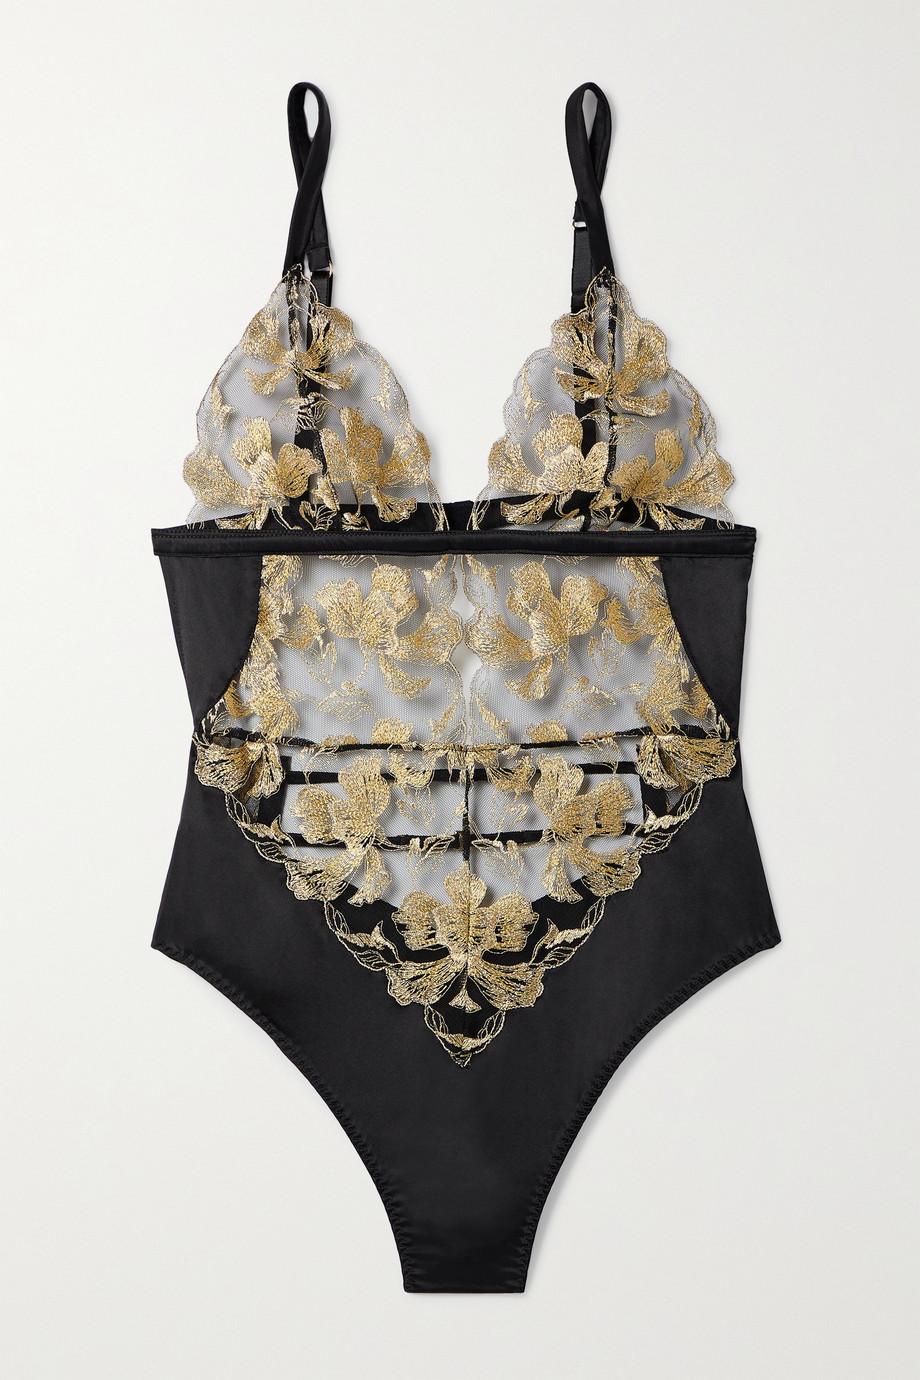 Coco de Mer Aria metallic embroidered tulle and satin bodysuit